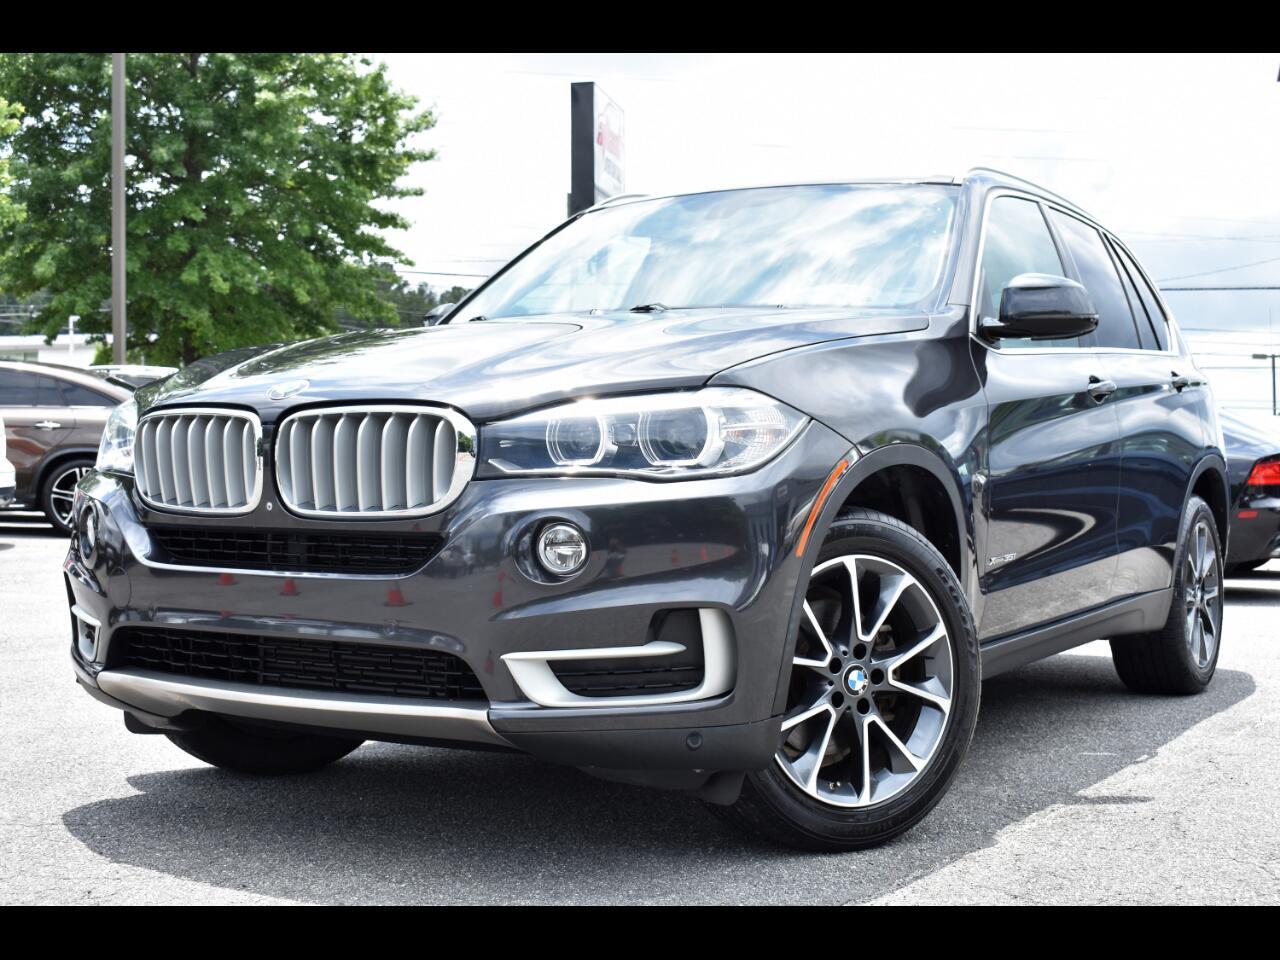 BMW X5 XDrive35i 4D SAV 2015